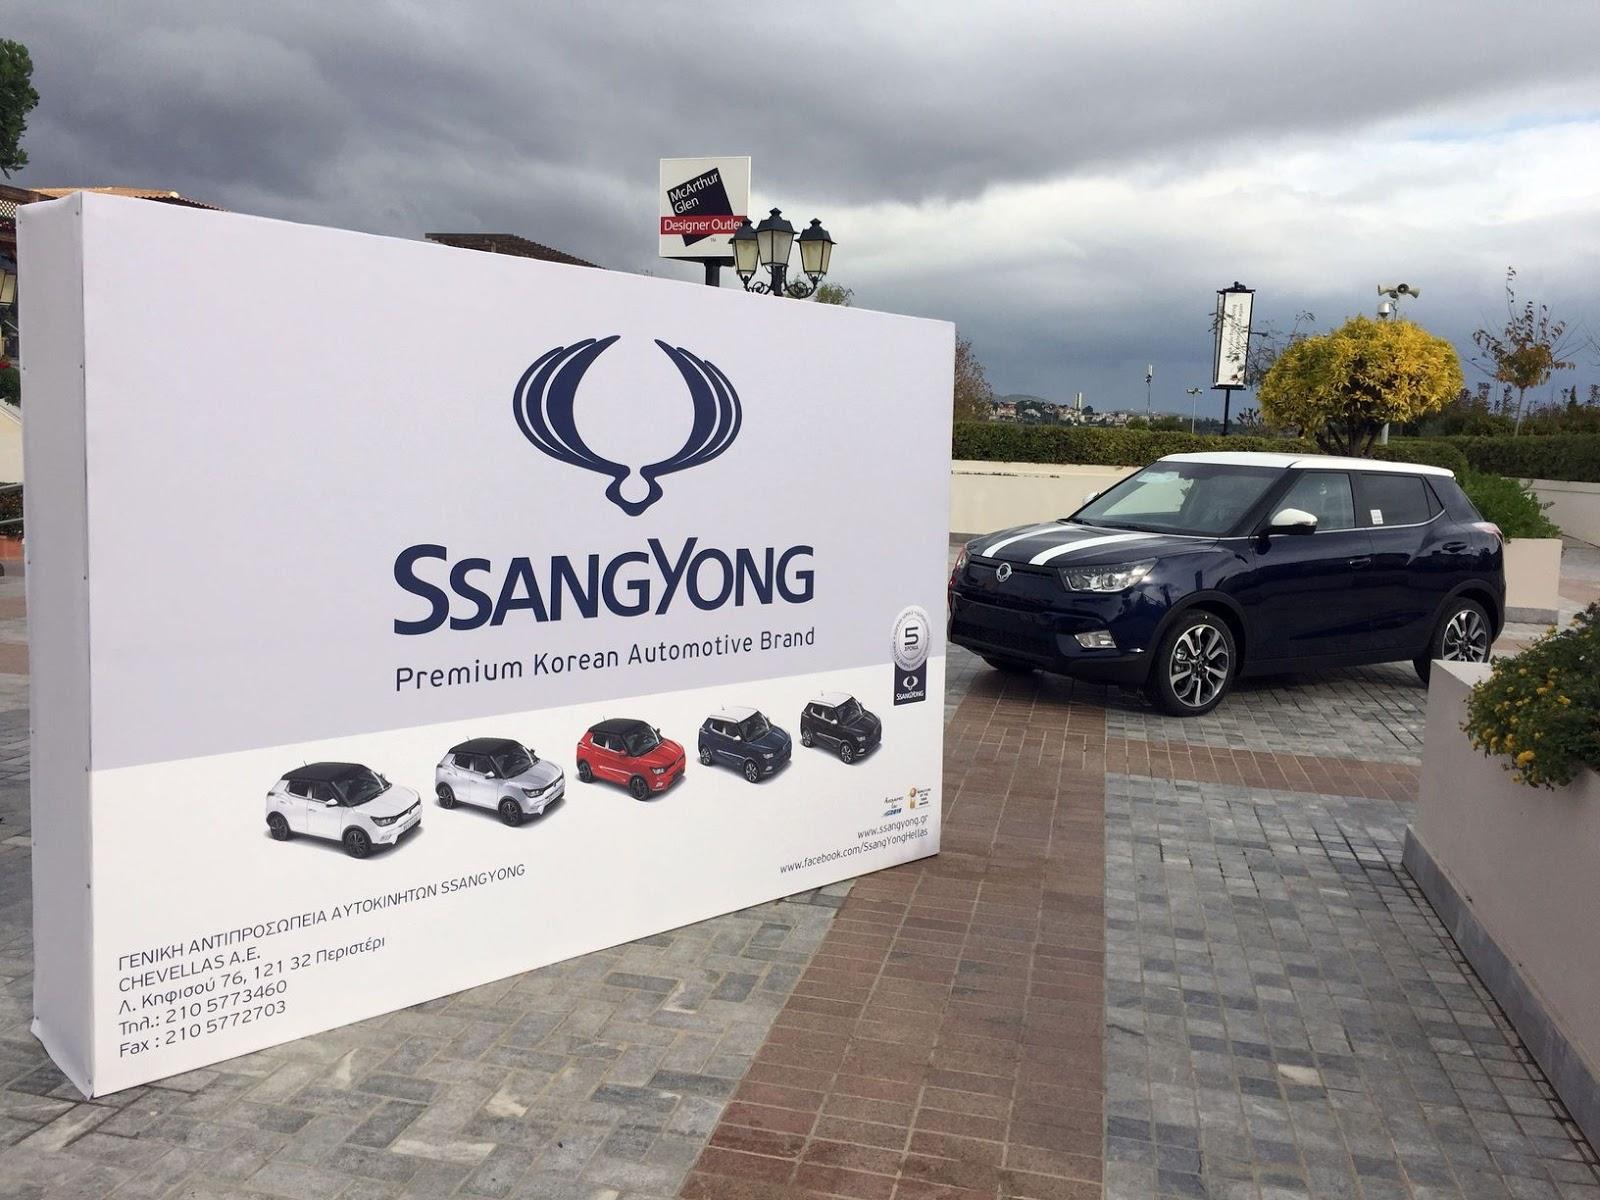 4%2BSY%2BMAG Δες και οδήγησε το SsangYong TIVOLI 1.6 Diesel στο εμπορικό κέντρο McARTHURGLEN SsangYong, SsangYong Actyon, SsangYong Actyon Sports, SsangYong Rexton, SsangYong Tivoli